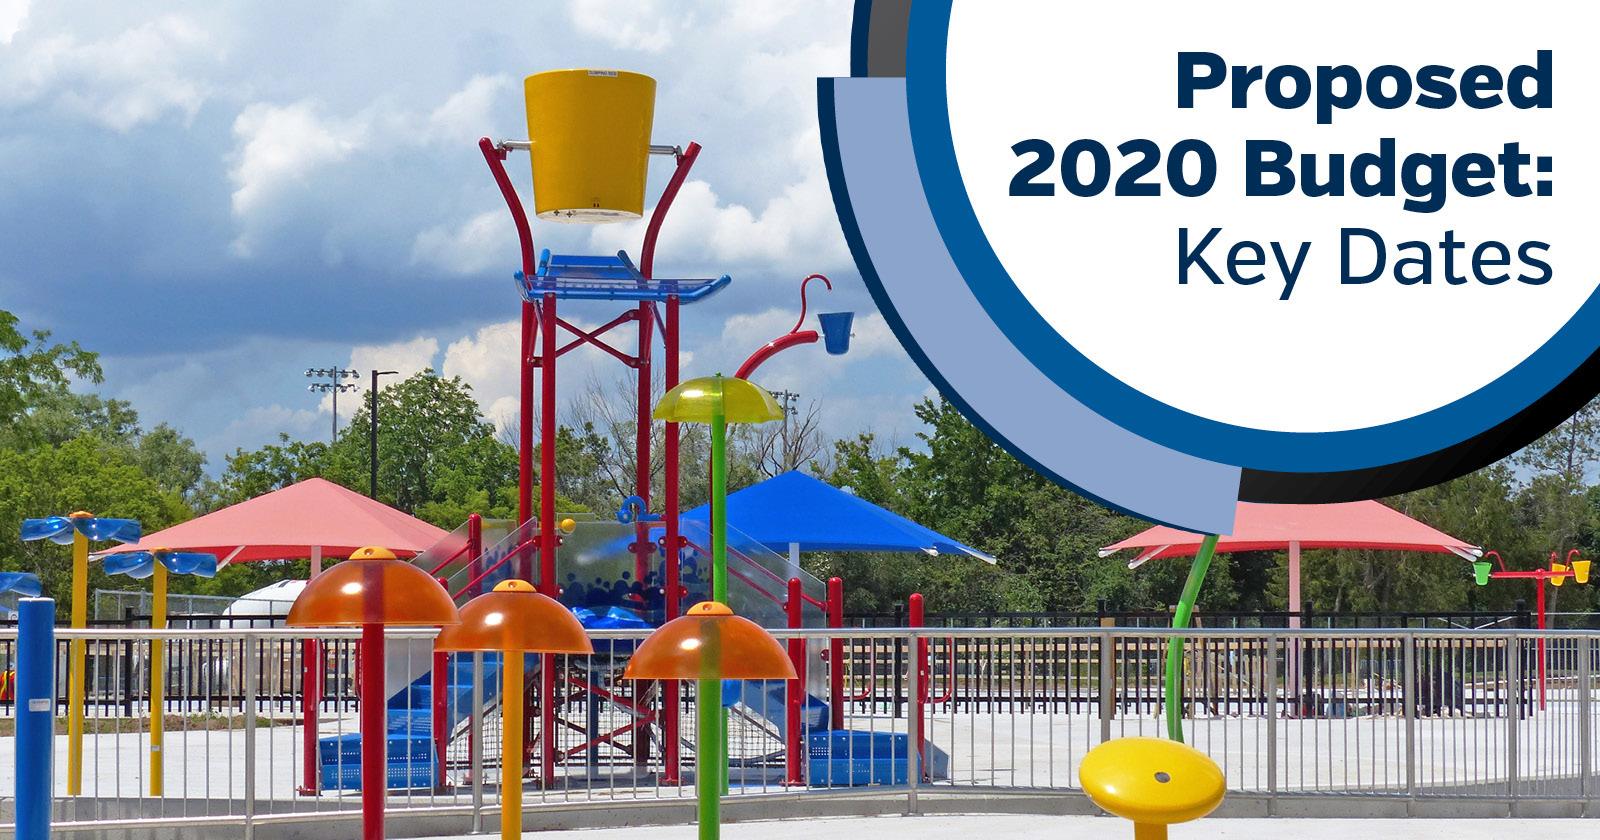 2020 Budget - Key Meeting Dates Coming Up